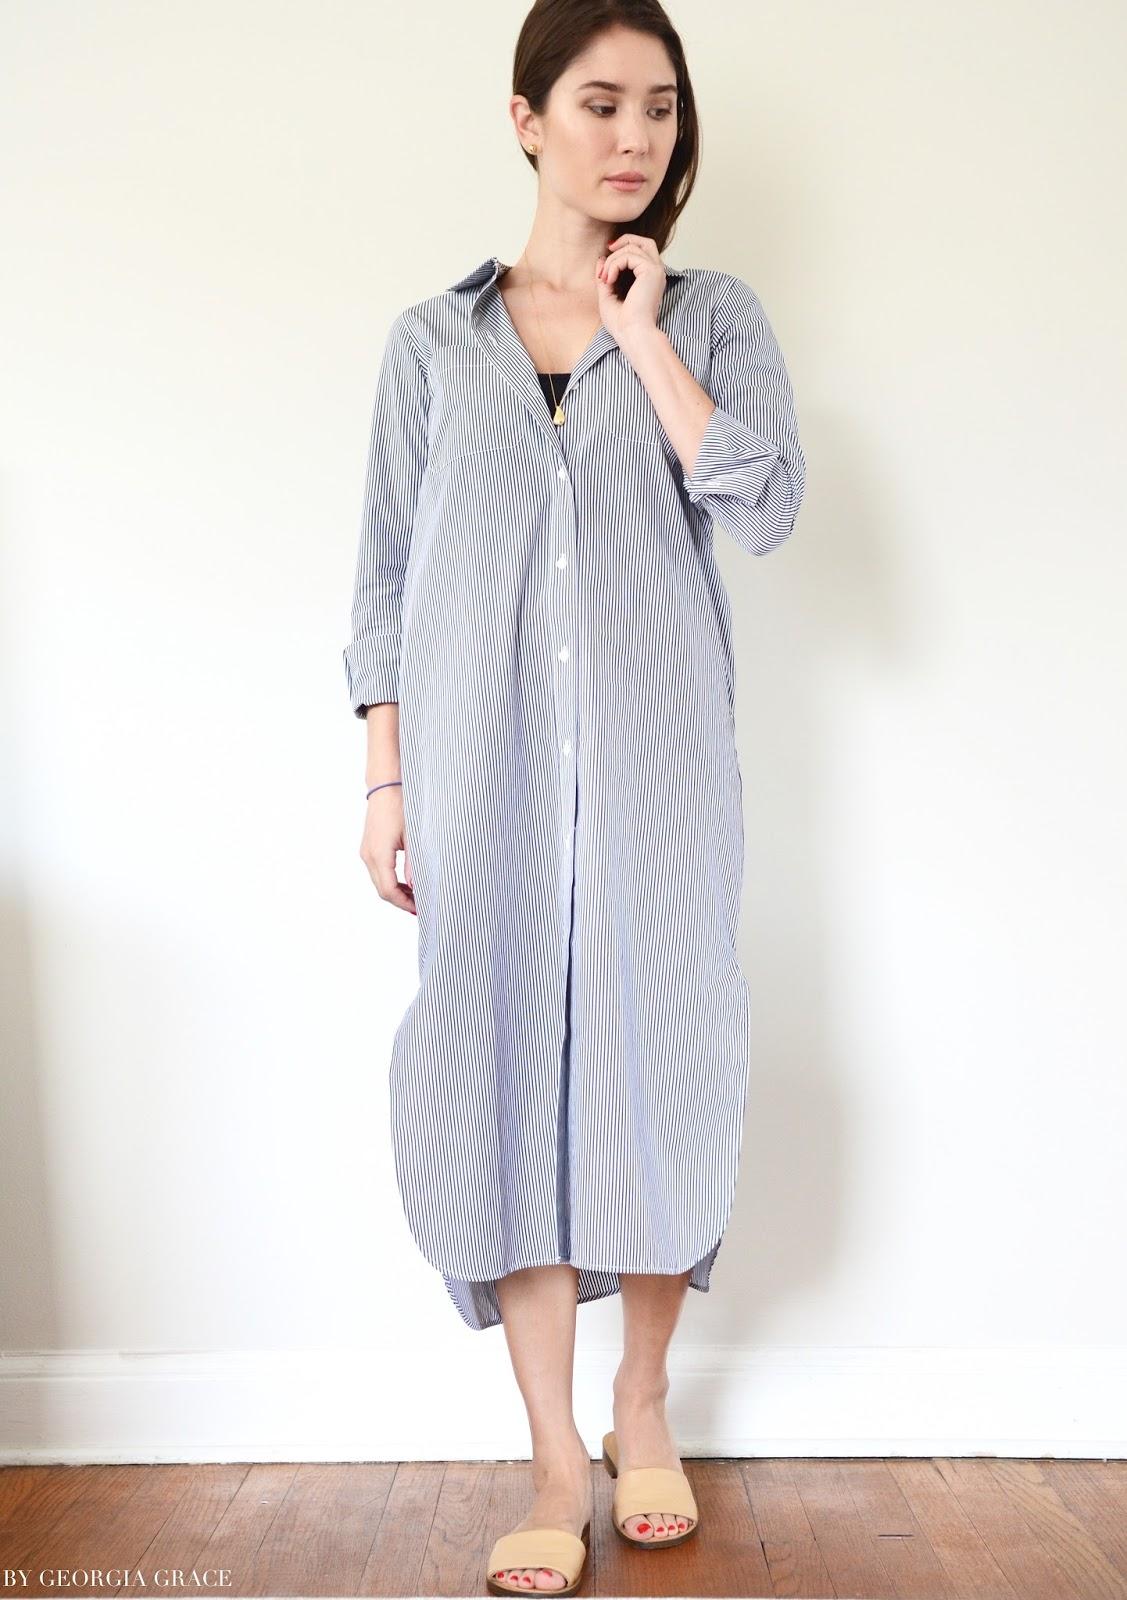 Everlane Striped Cotton Poplin Long Shirt Dress Review By